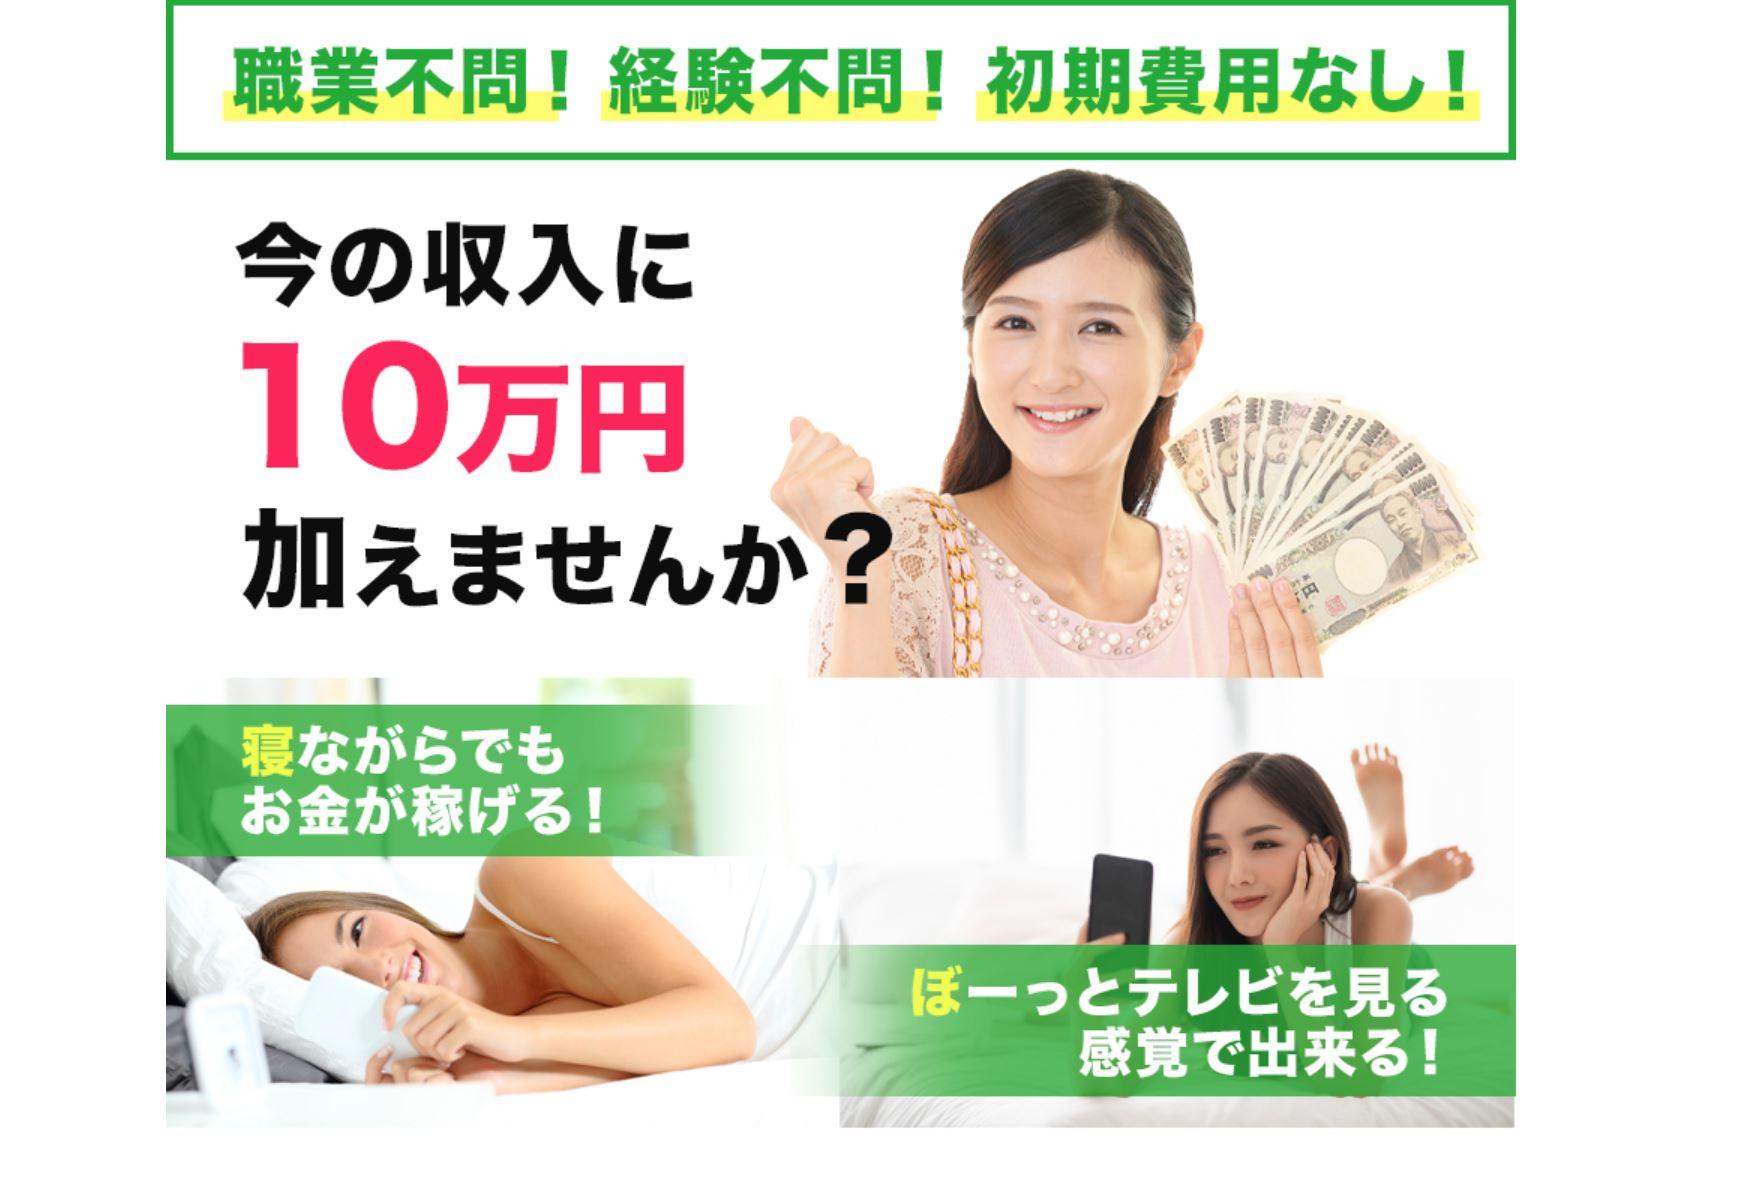 PREMIUM 今の収入に10万円を加えませんかは稼げない!?副業案件調査